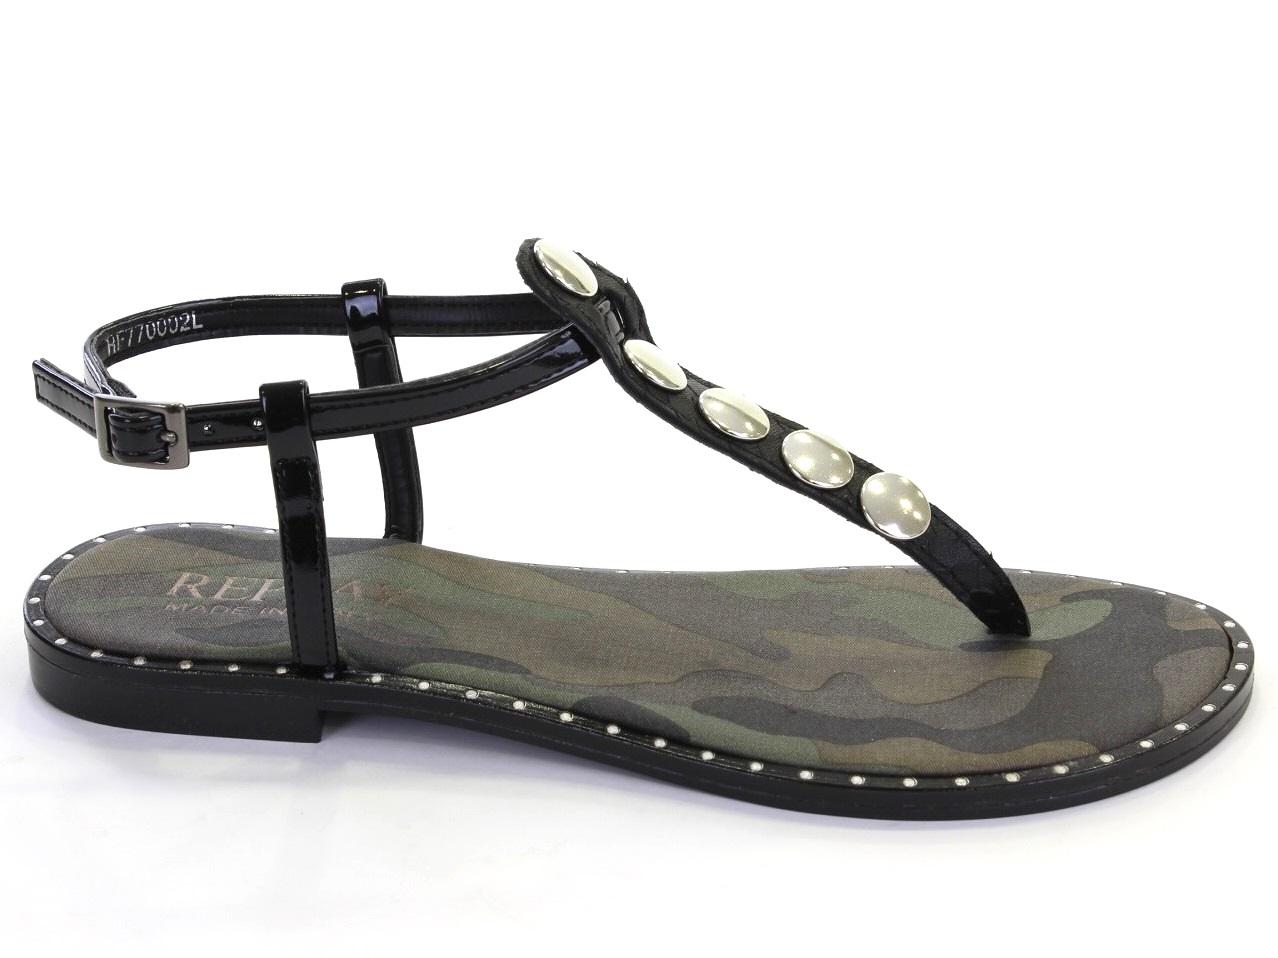 Sandales Plates Replay - 621 ELETTRA